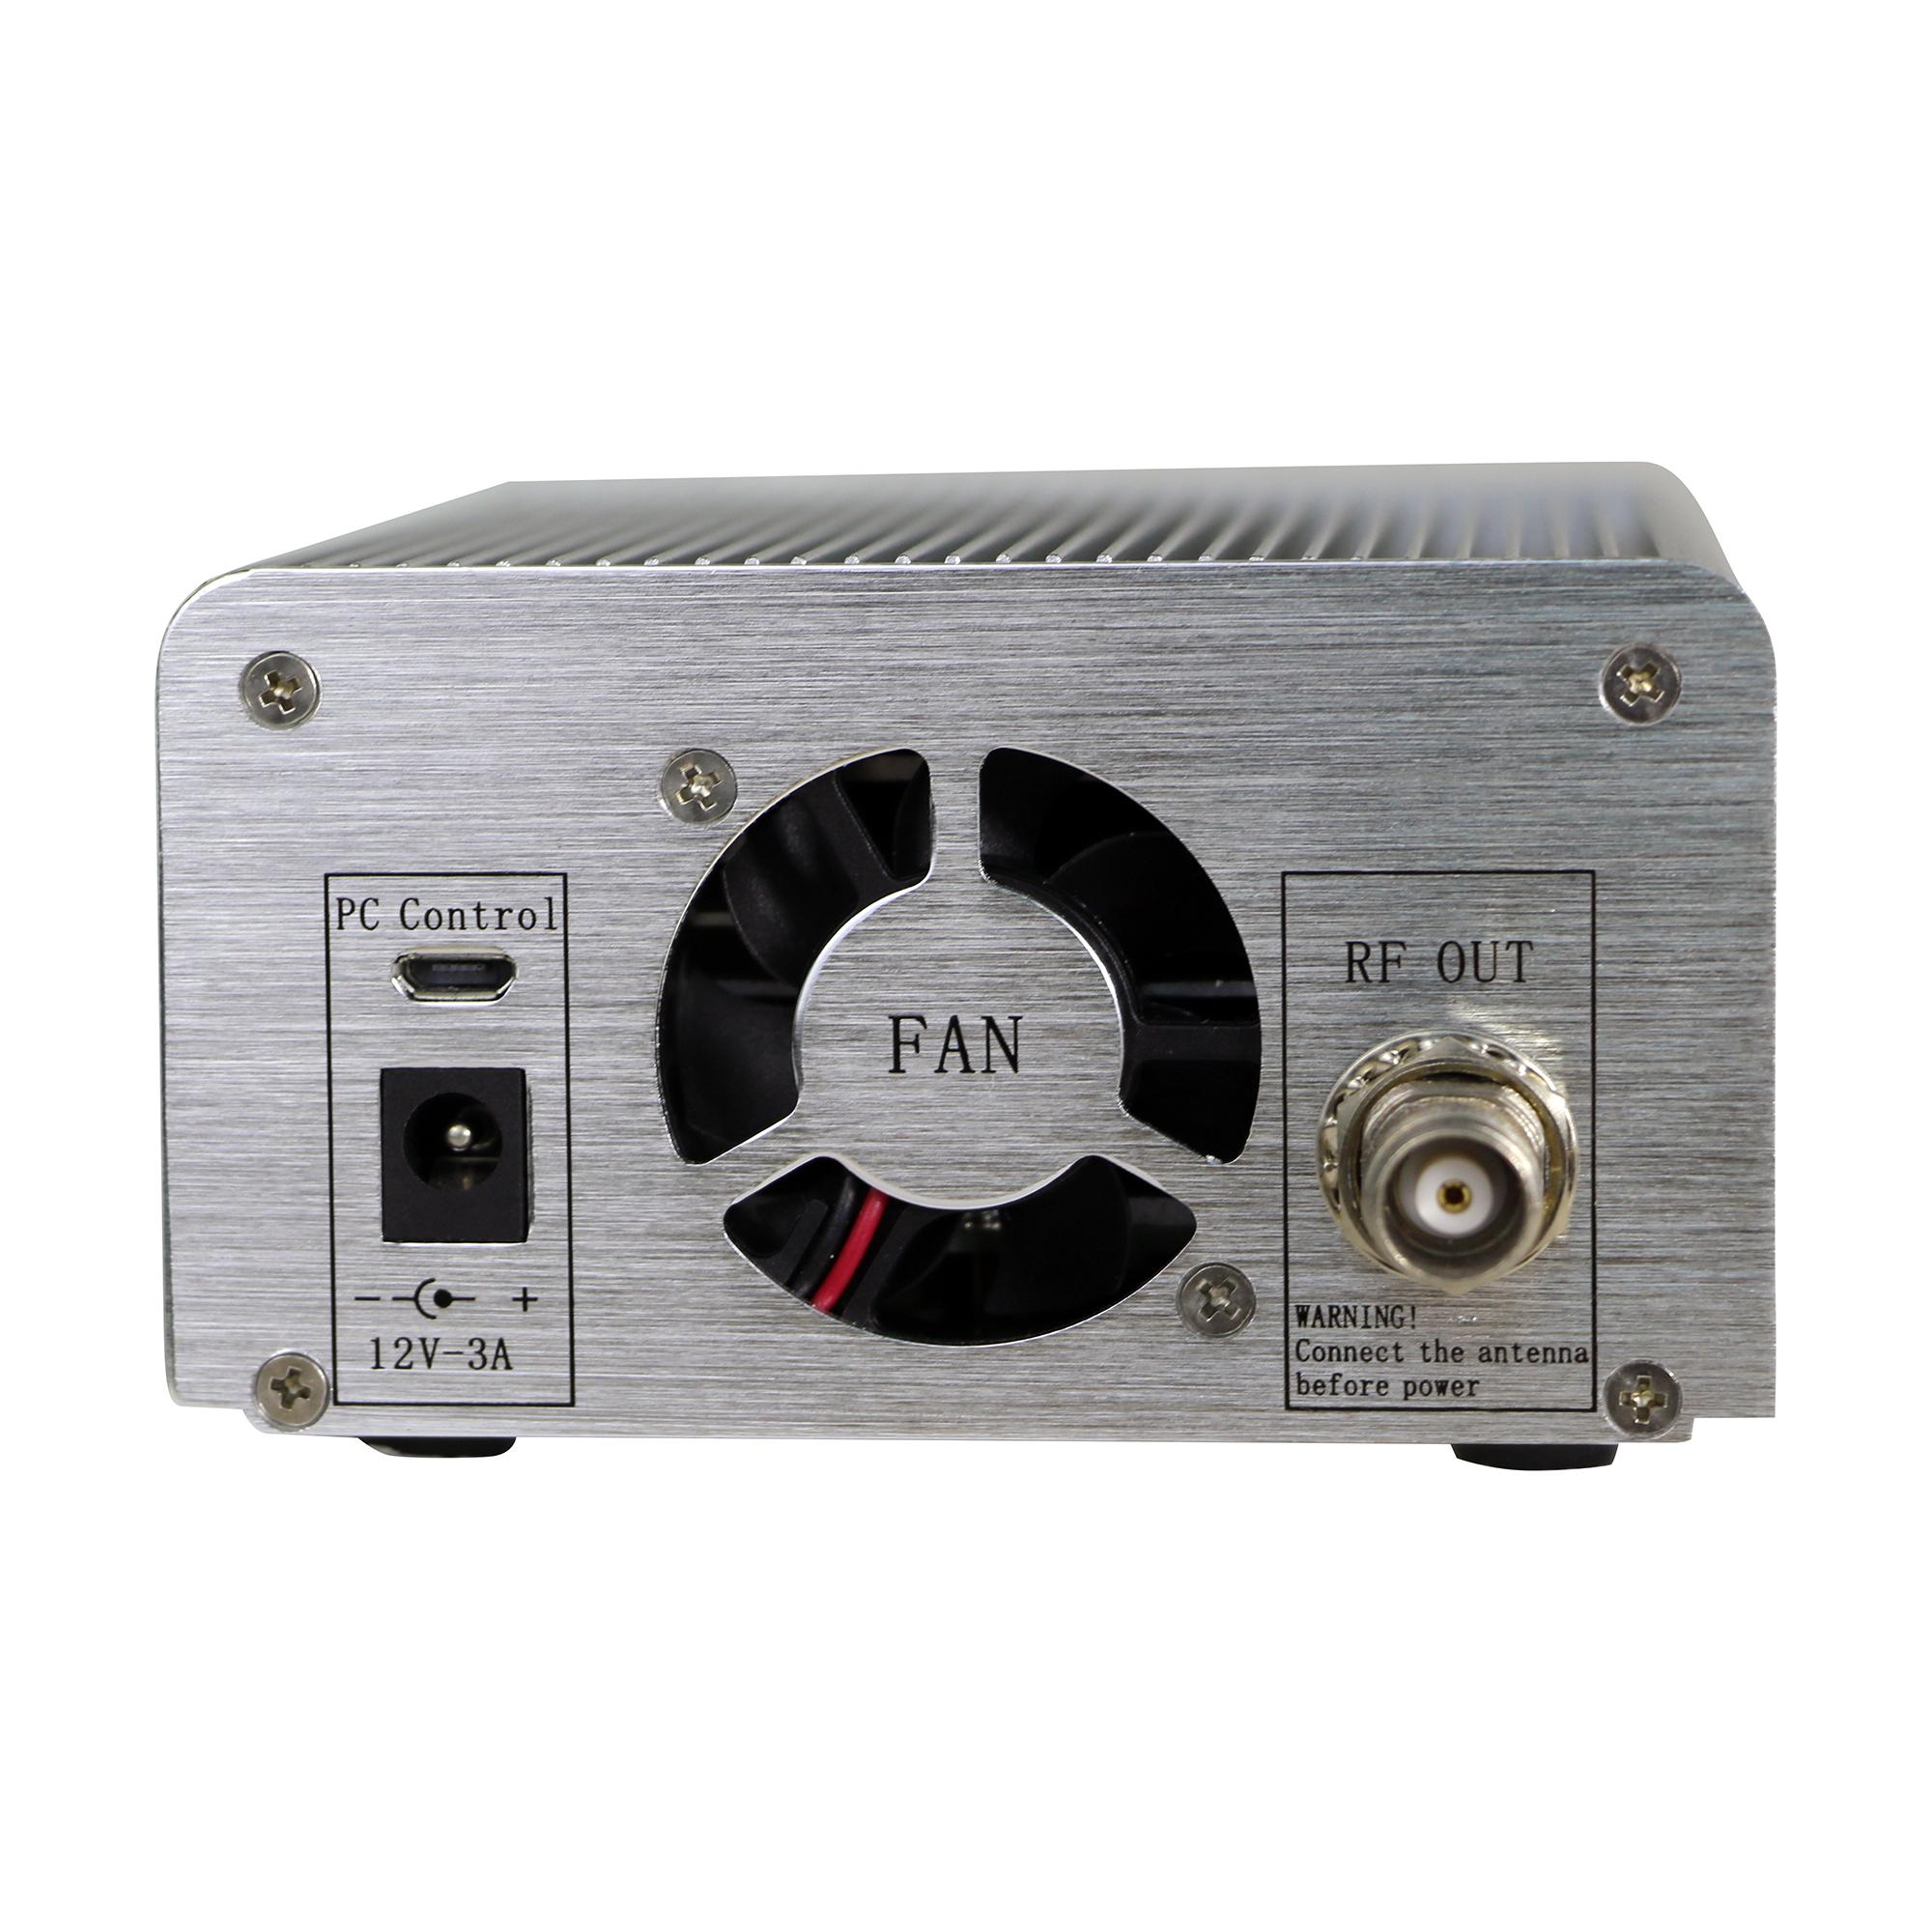 15w调频发射机立体声FM广播调频发射器发射蓝牙音频发射器